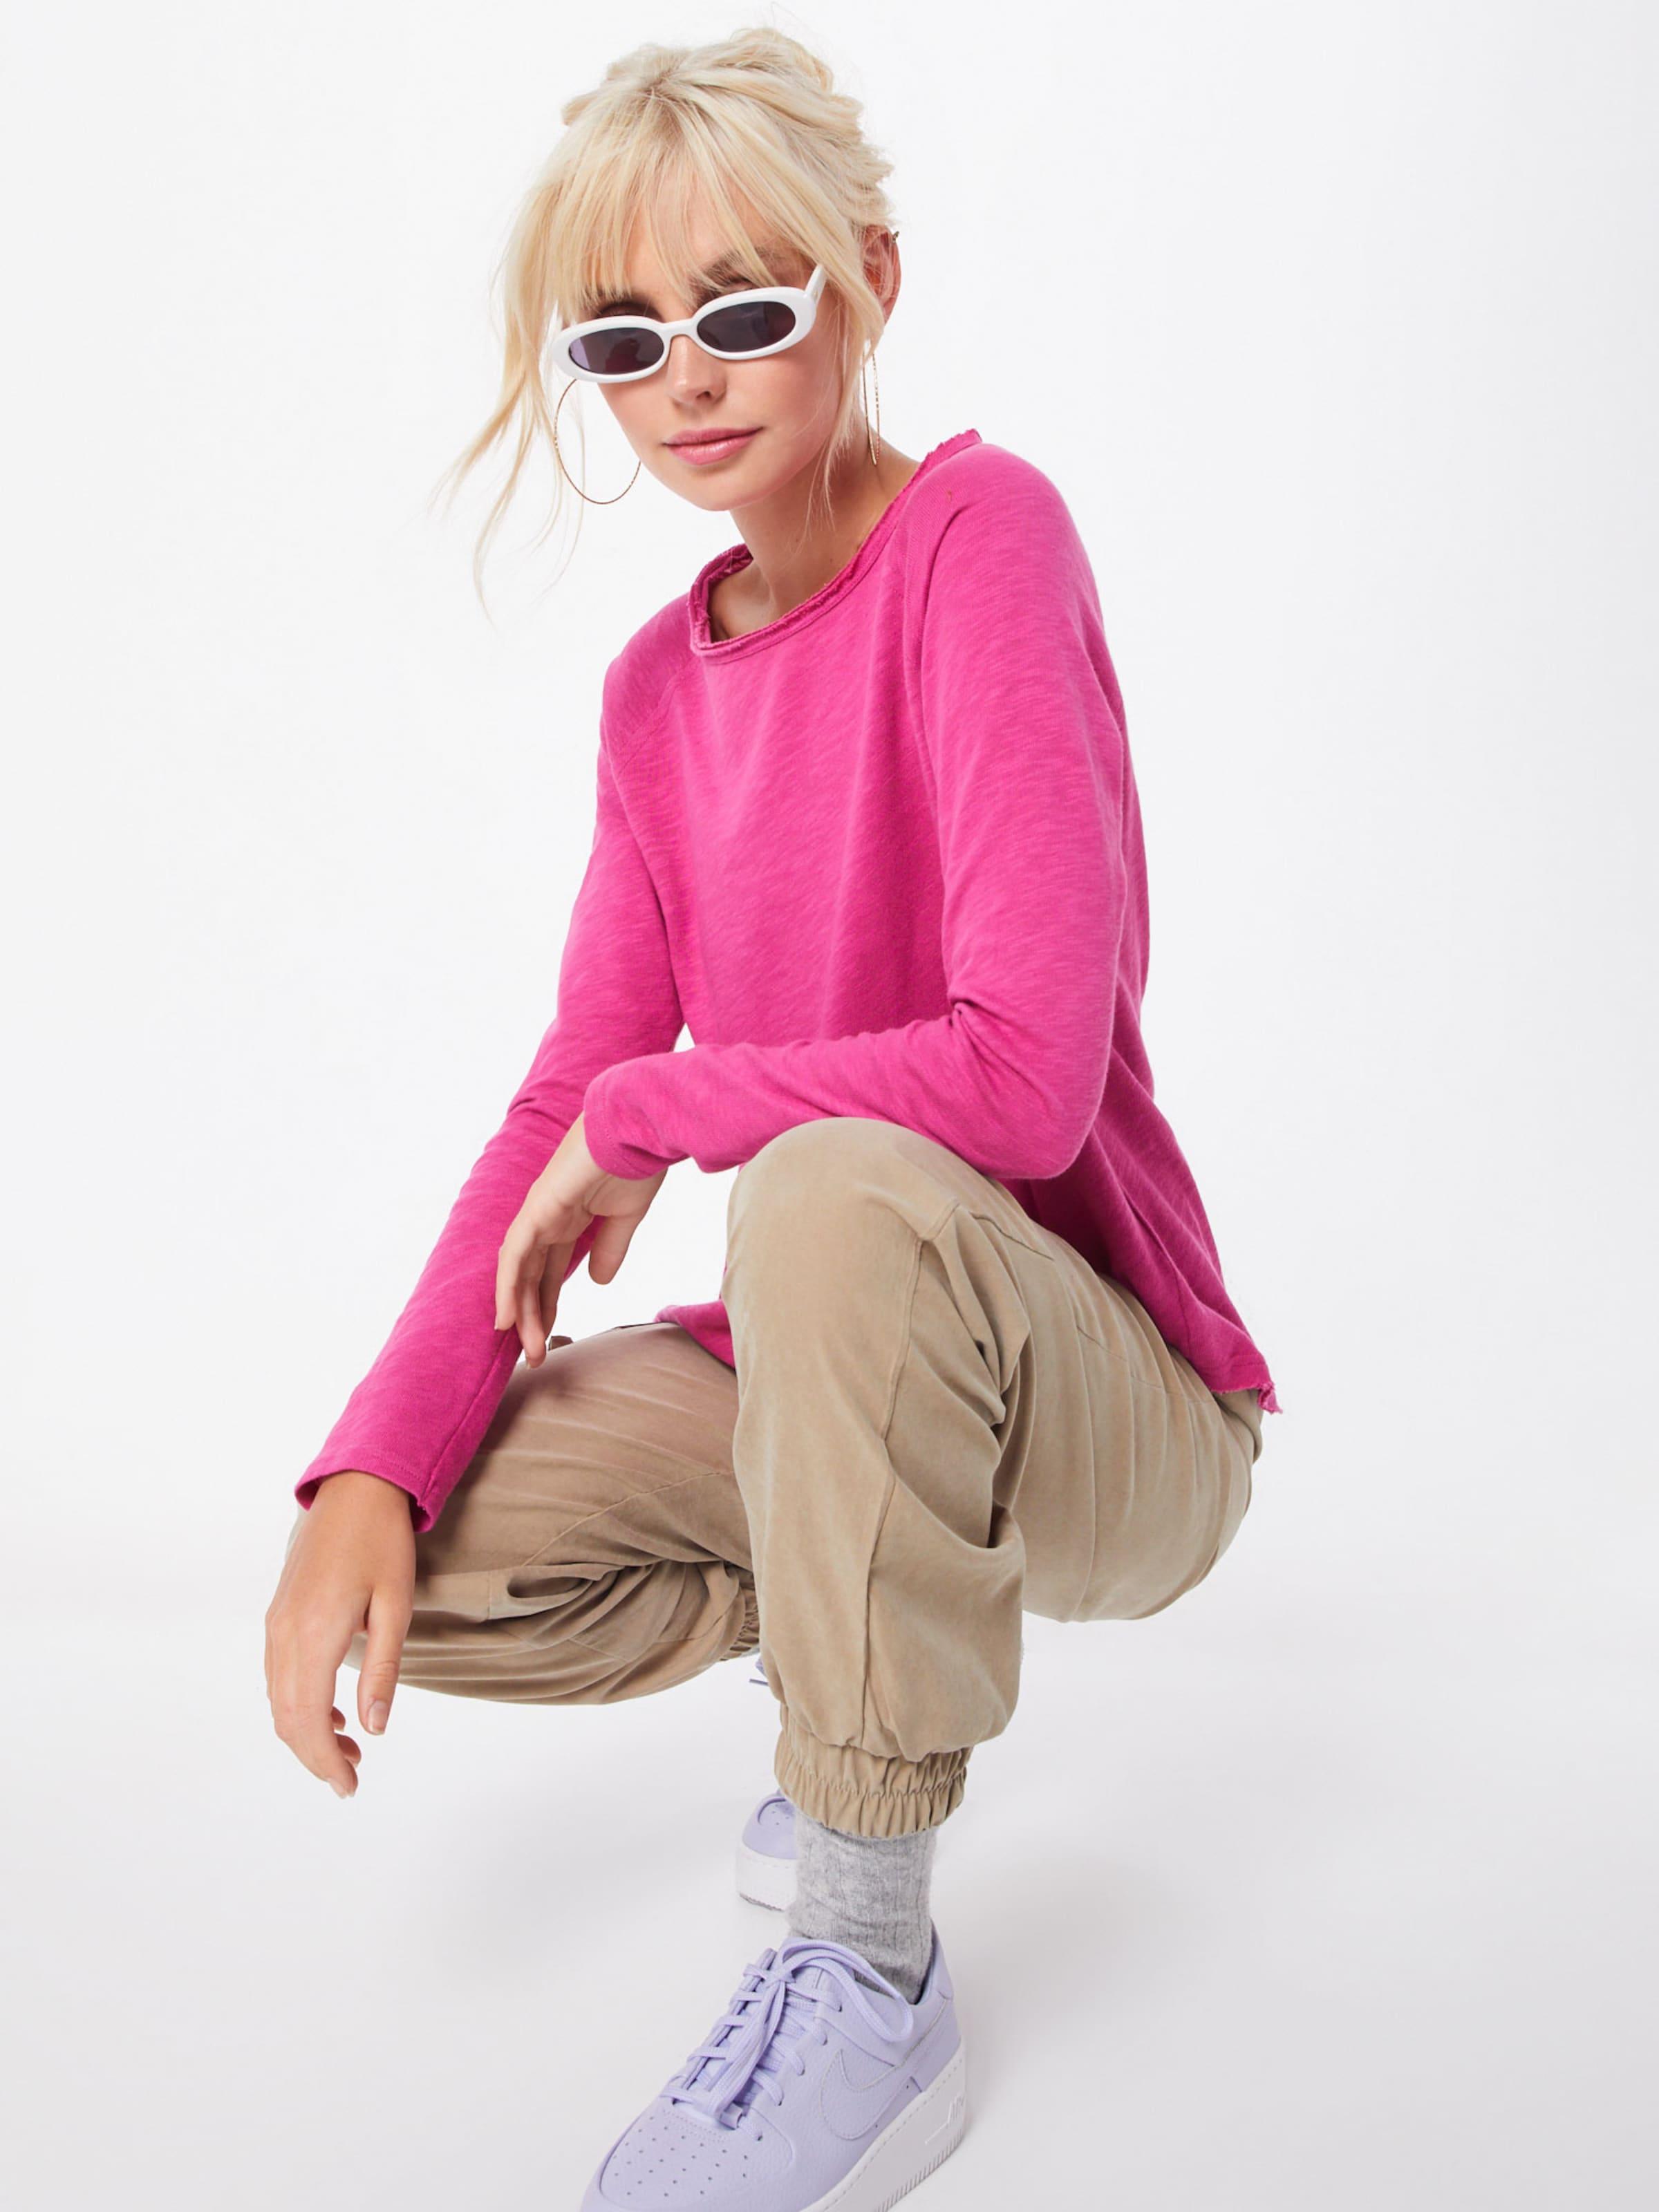 Rose T Royal En Richamp; shirt kPXuOZi